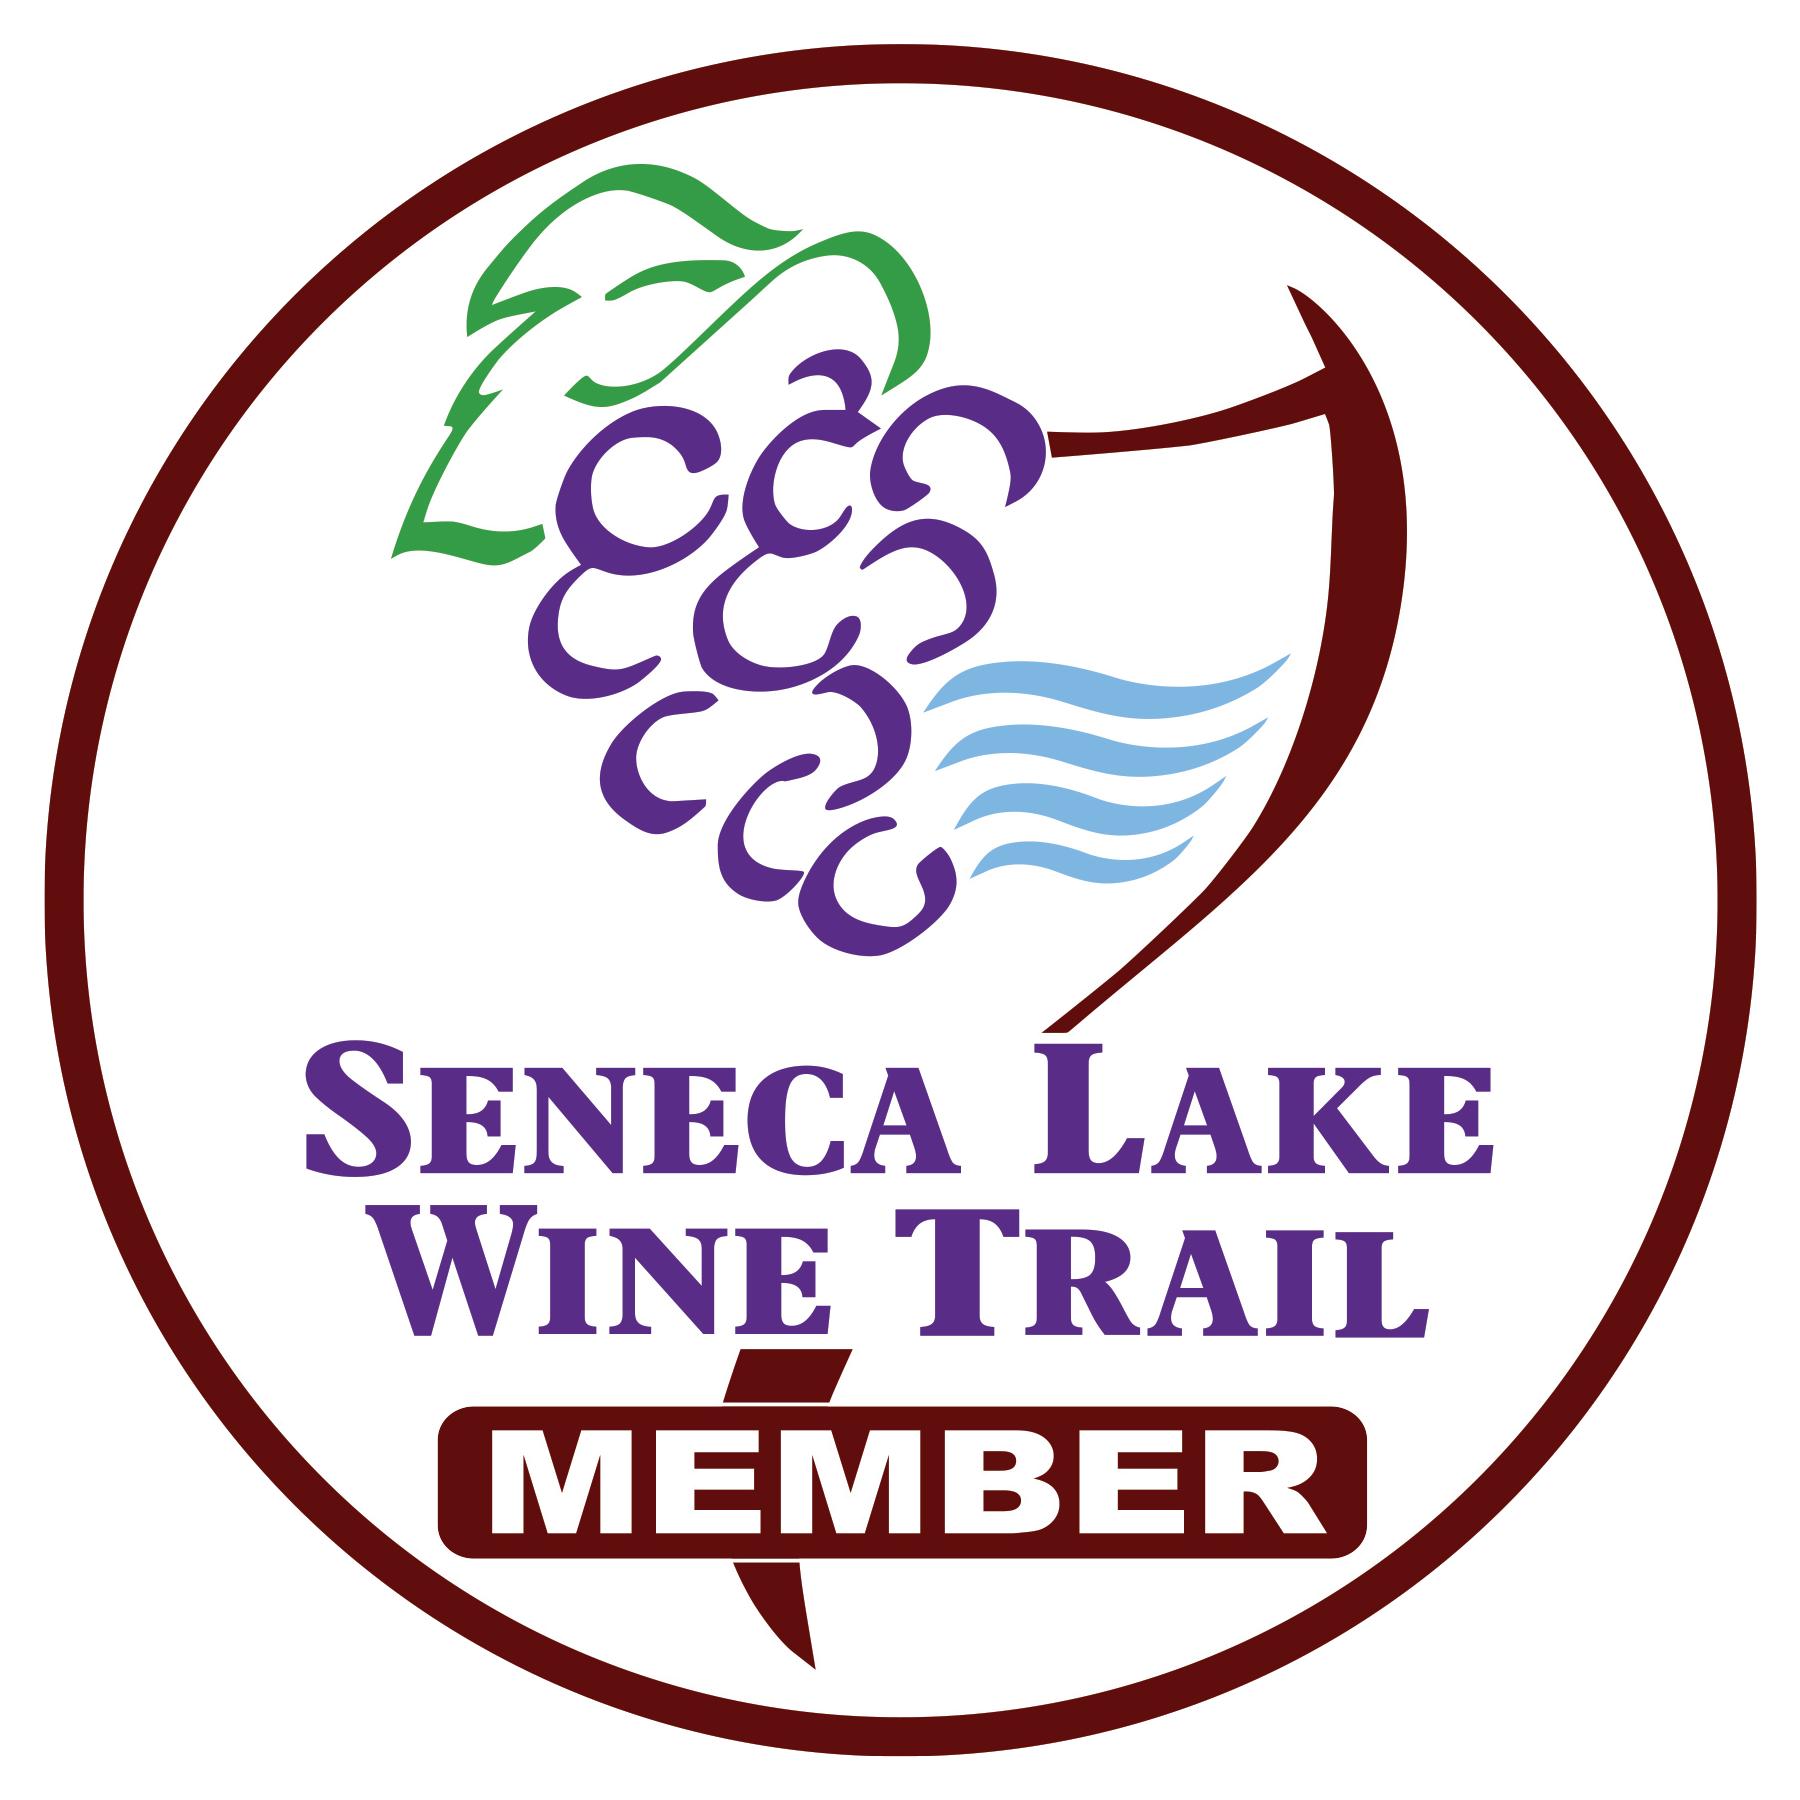 Finger Lakes - Seneca Lake Wine Trail in Finger Lakes Wine ... on seneca river map, seneca golf course map, seneca zoo map,